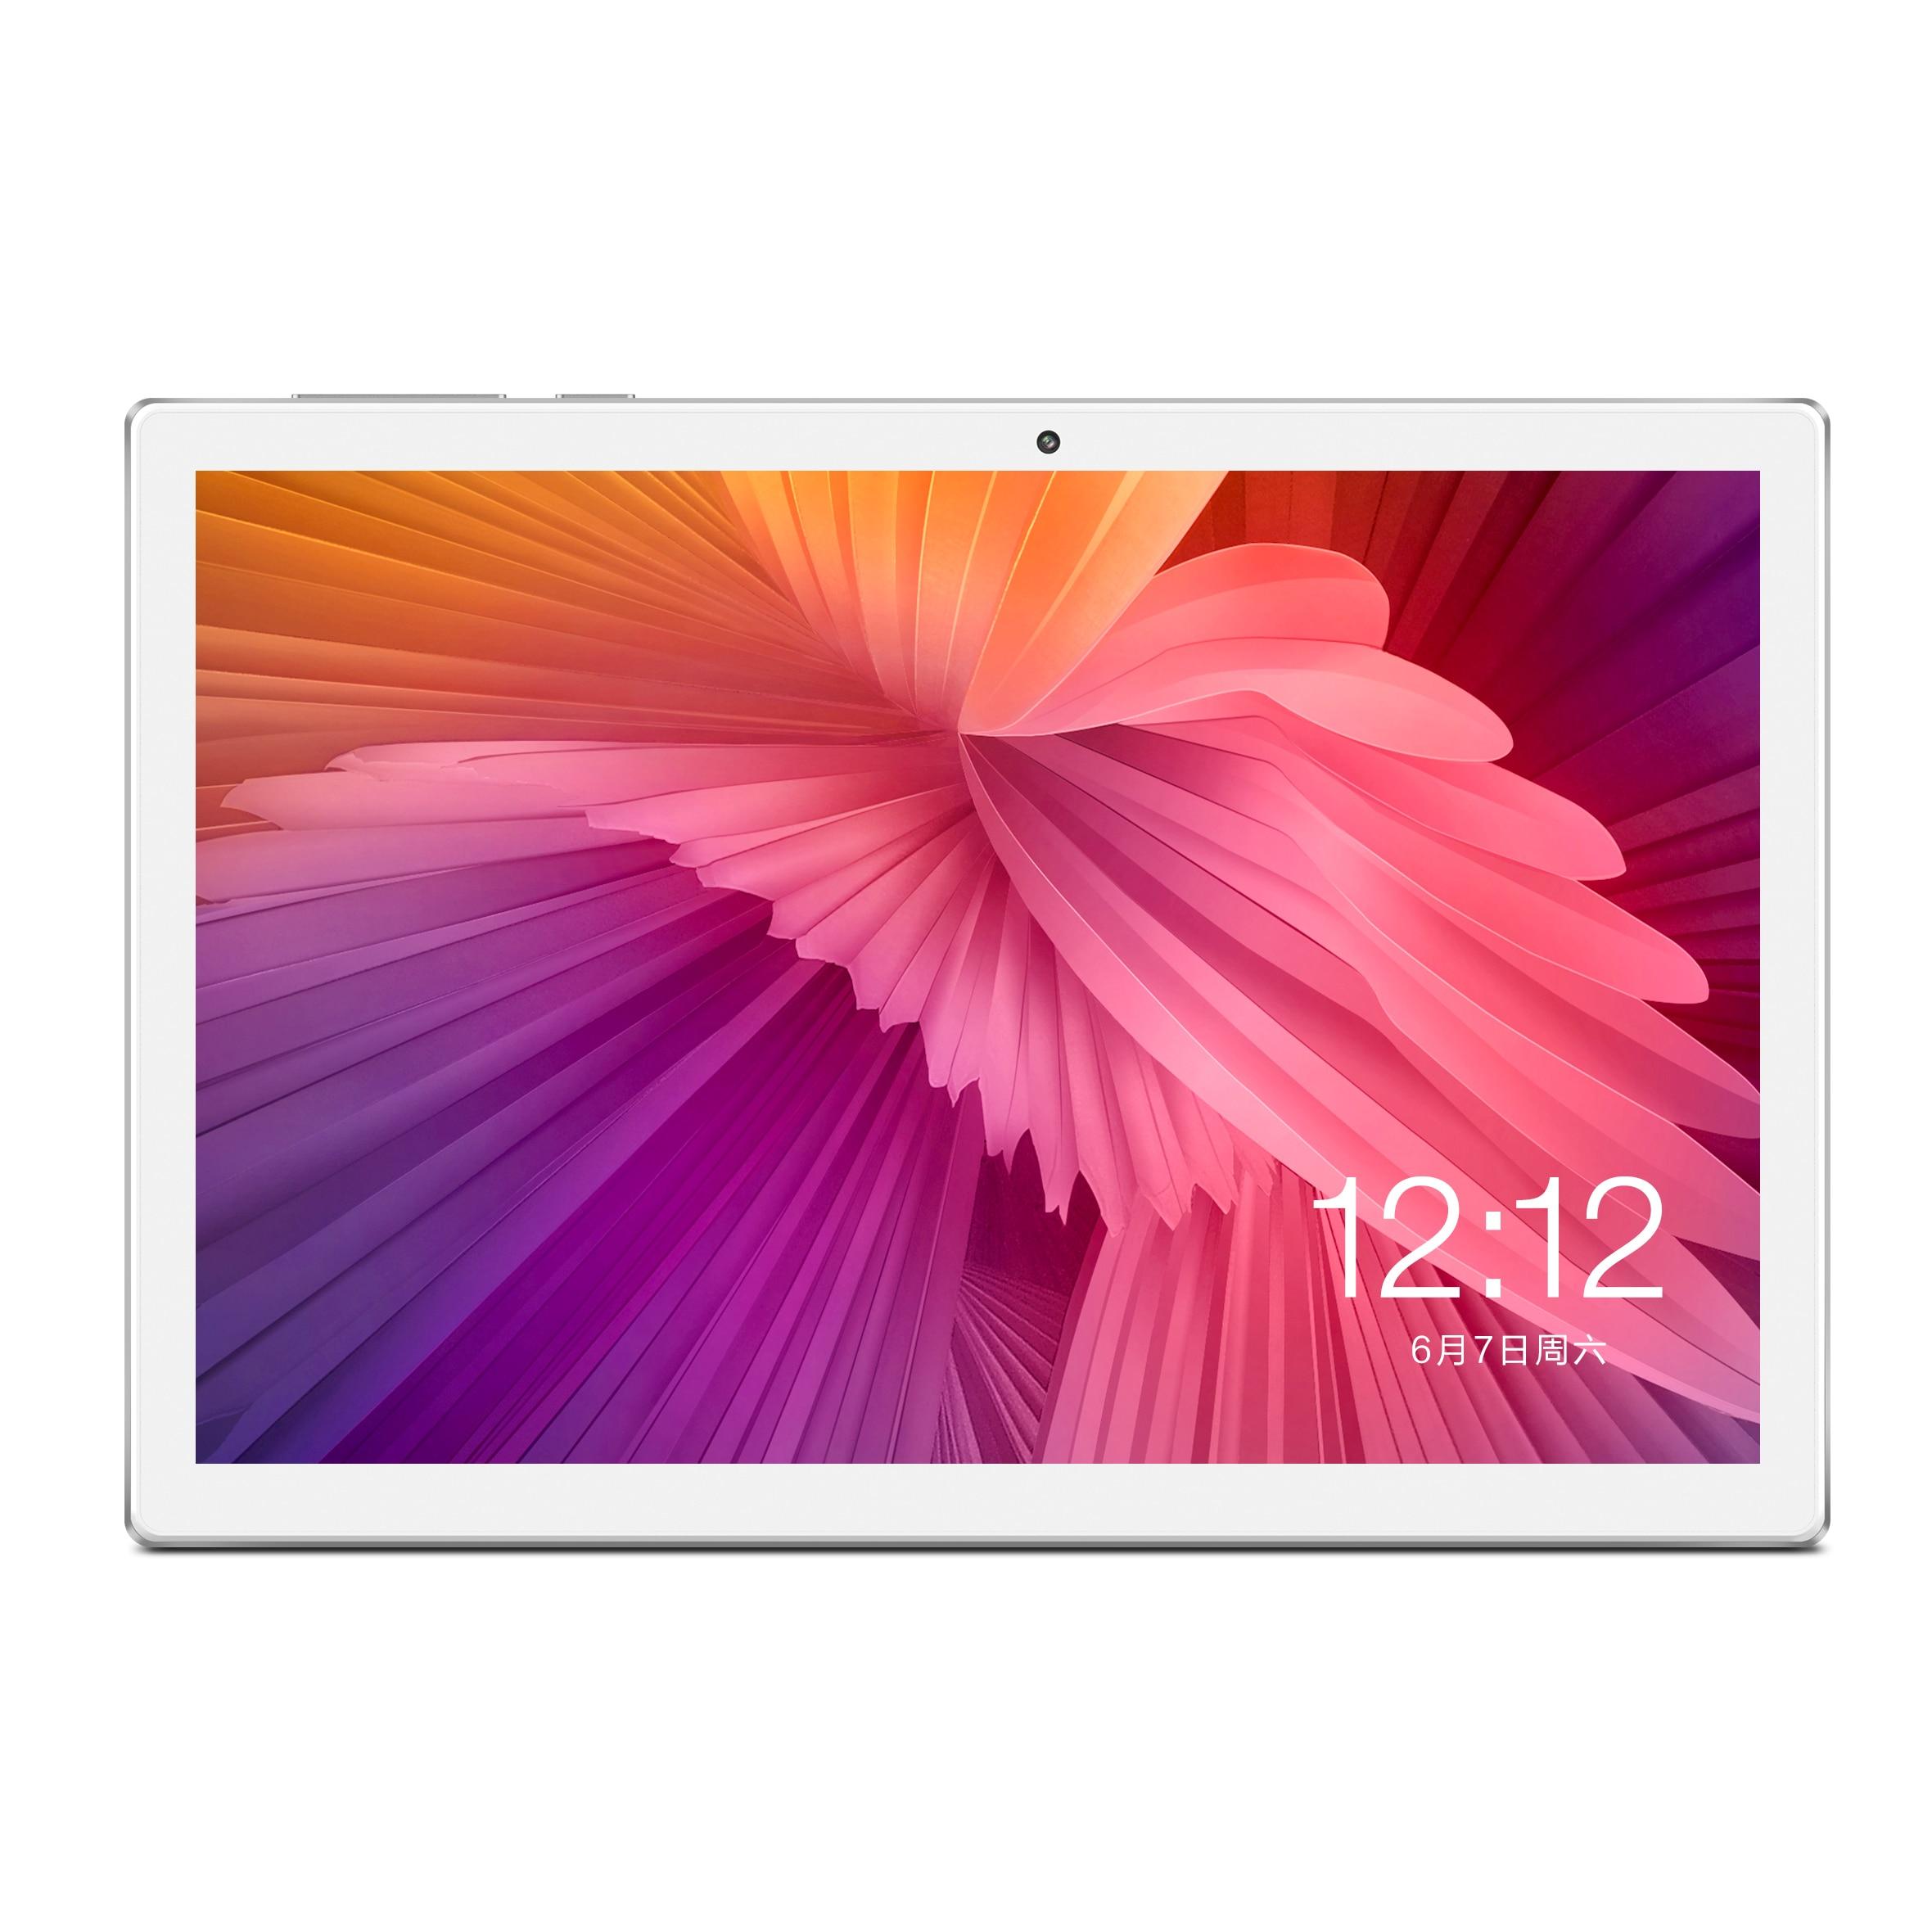 Teclast m30 10.1 Polegada 4g android 8.0 mt6797x (x27) 1.4 ghz decore cpu 3 gb ram 64 gb rom 5.0mp + 2.0mp tipo-c chamada de telefone tablet pc